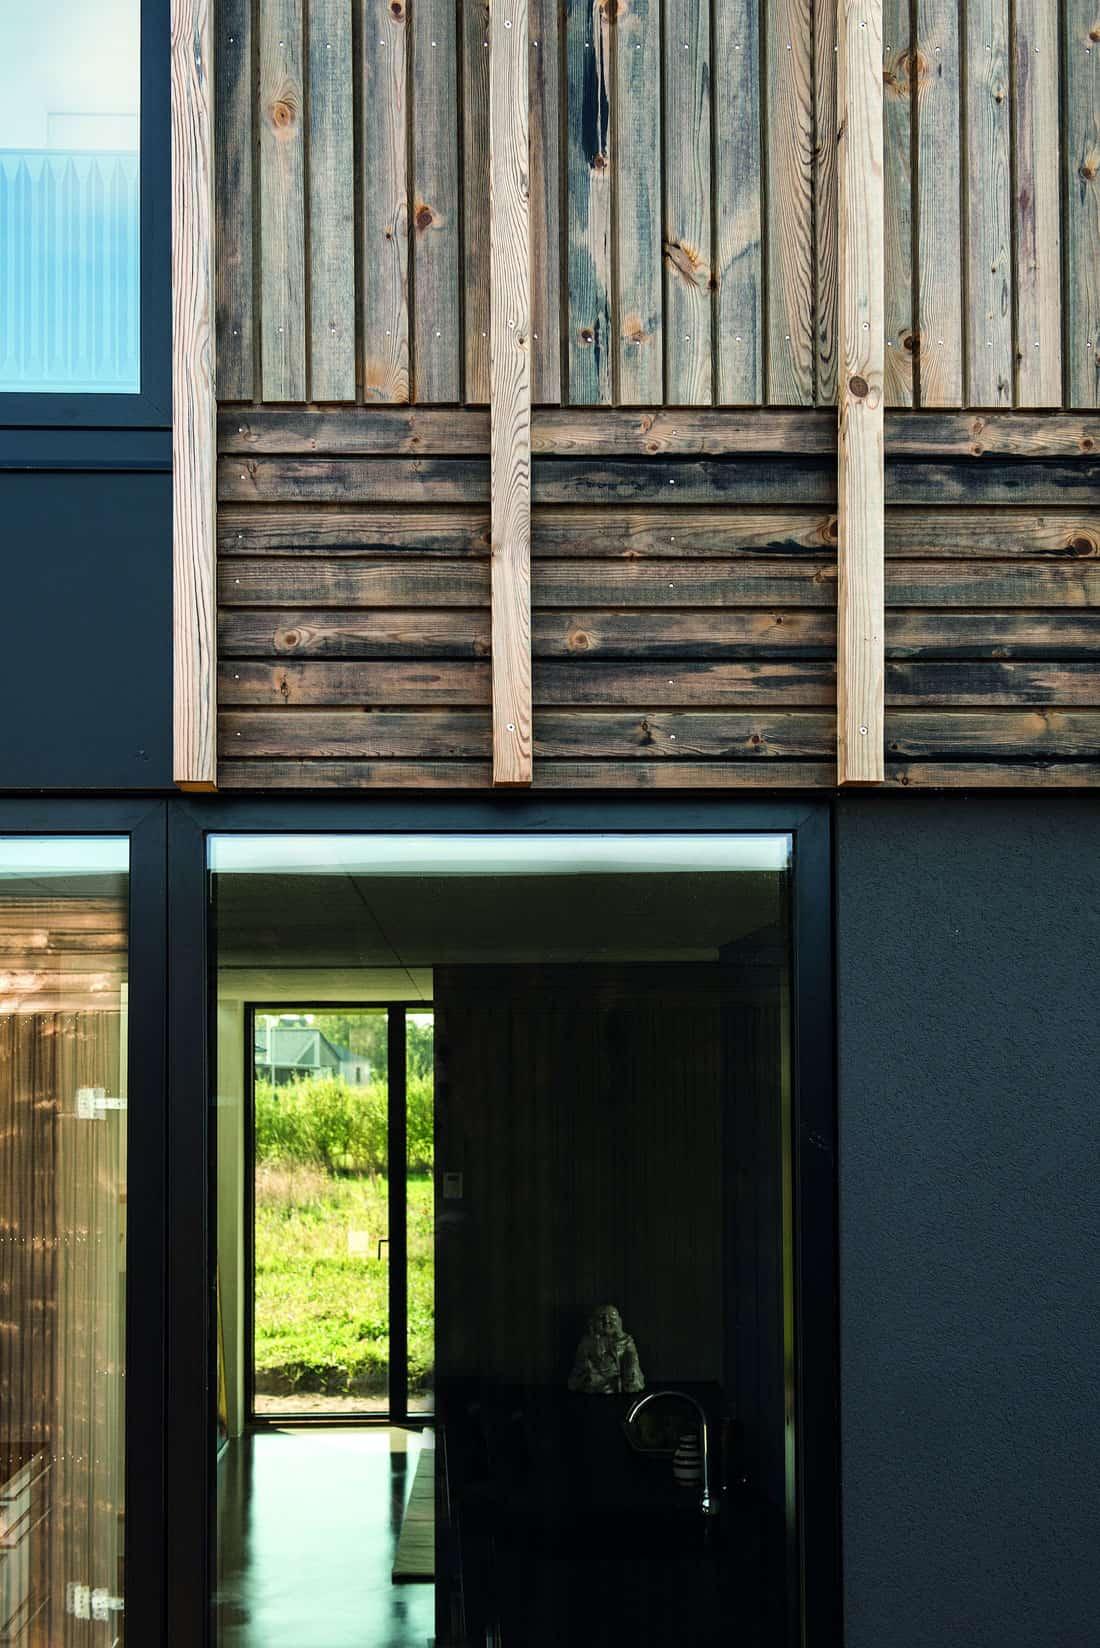 The Adaptable House by Henning Larsen & Realdania (5)